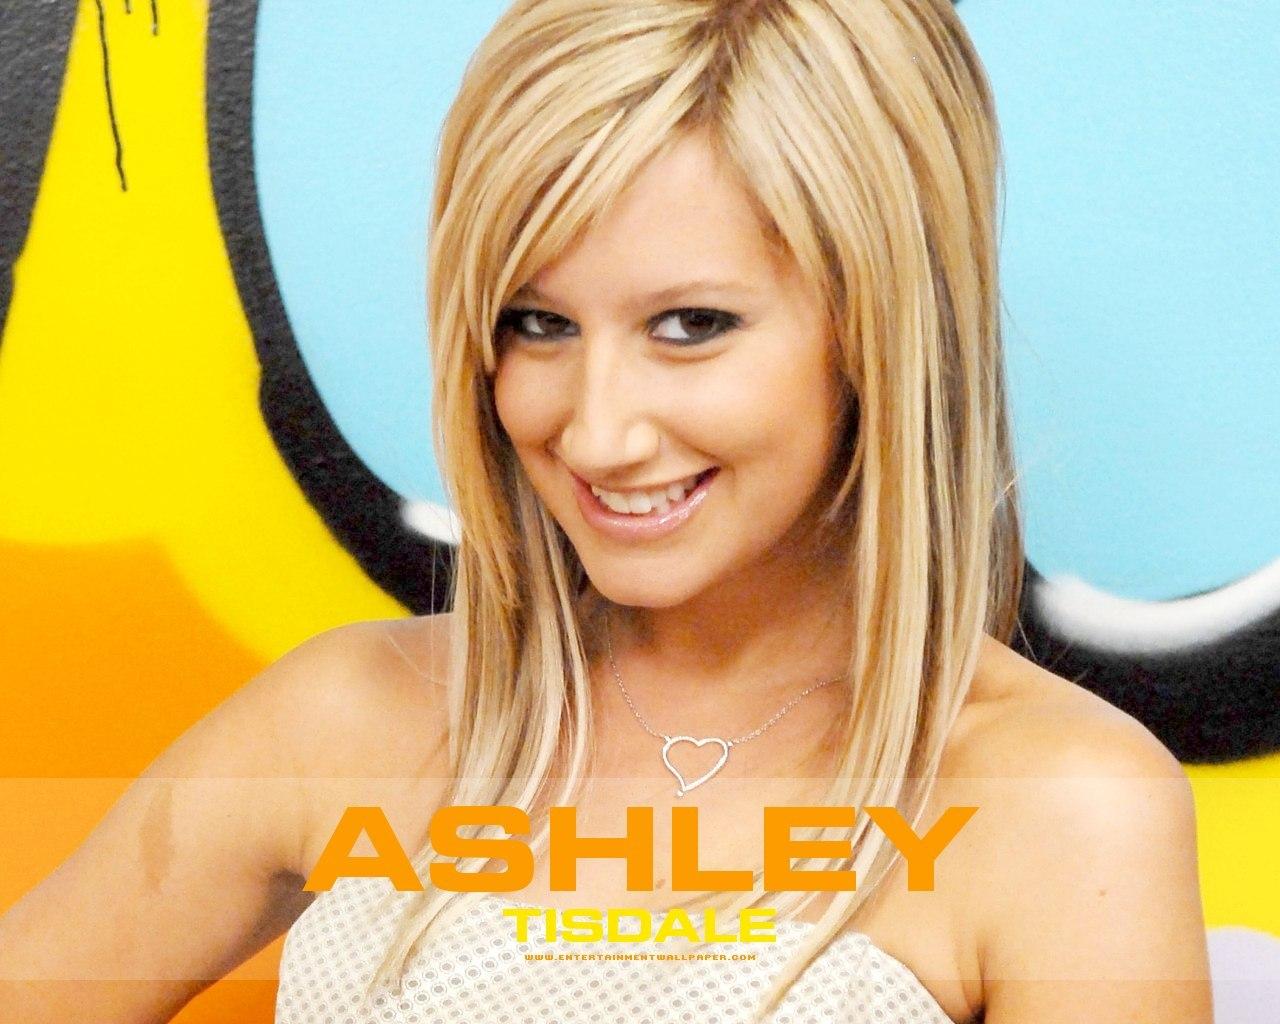 http://2.bp.blogspot.com/-0_CcJ-cLUic/T1AtS69kFII/AAAAAAAADQQ/dtSJypg2UQ8/s1600/ashley-tisdale-98.jpg